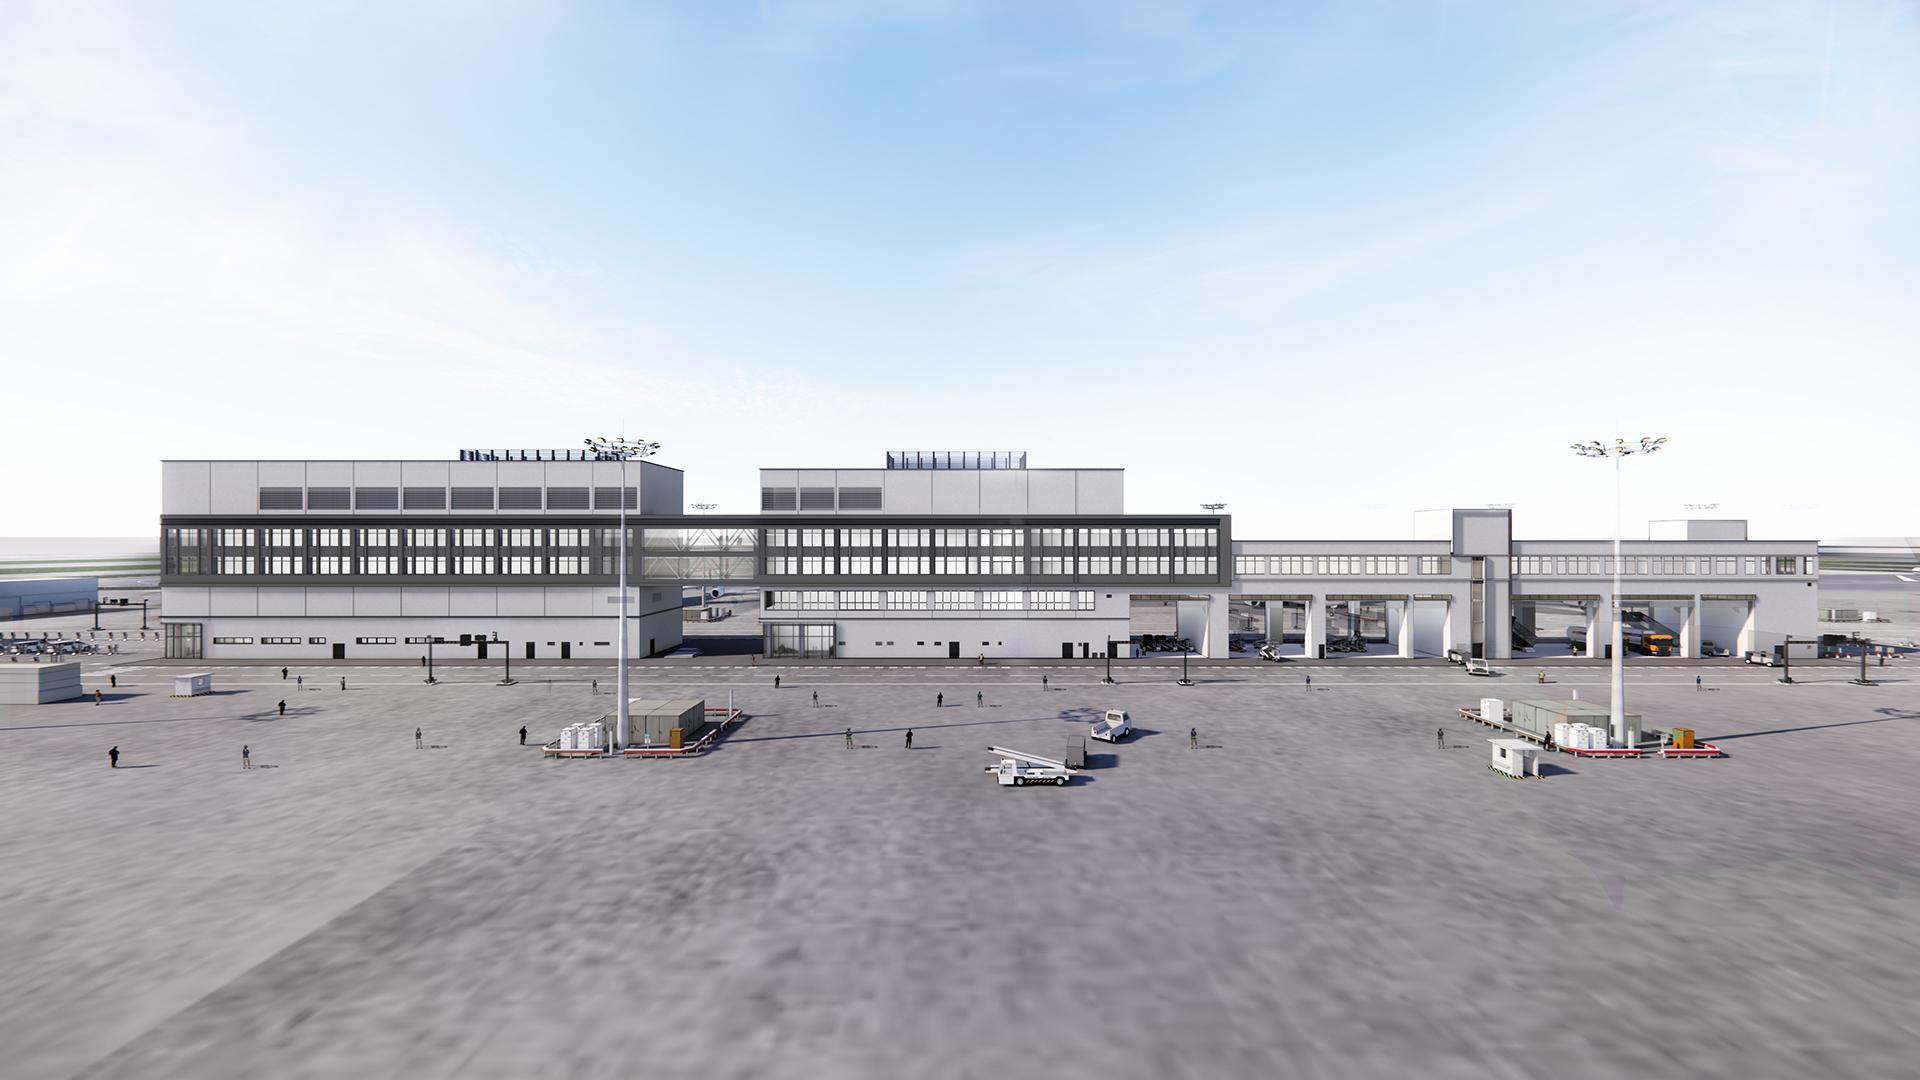 HONG KONG INTERNATIONAL AIRPORT DATA CENTRE AND MULTIPURPOSE BUILDING - C19W05